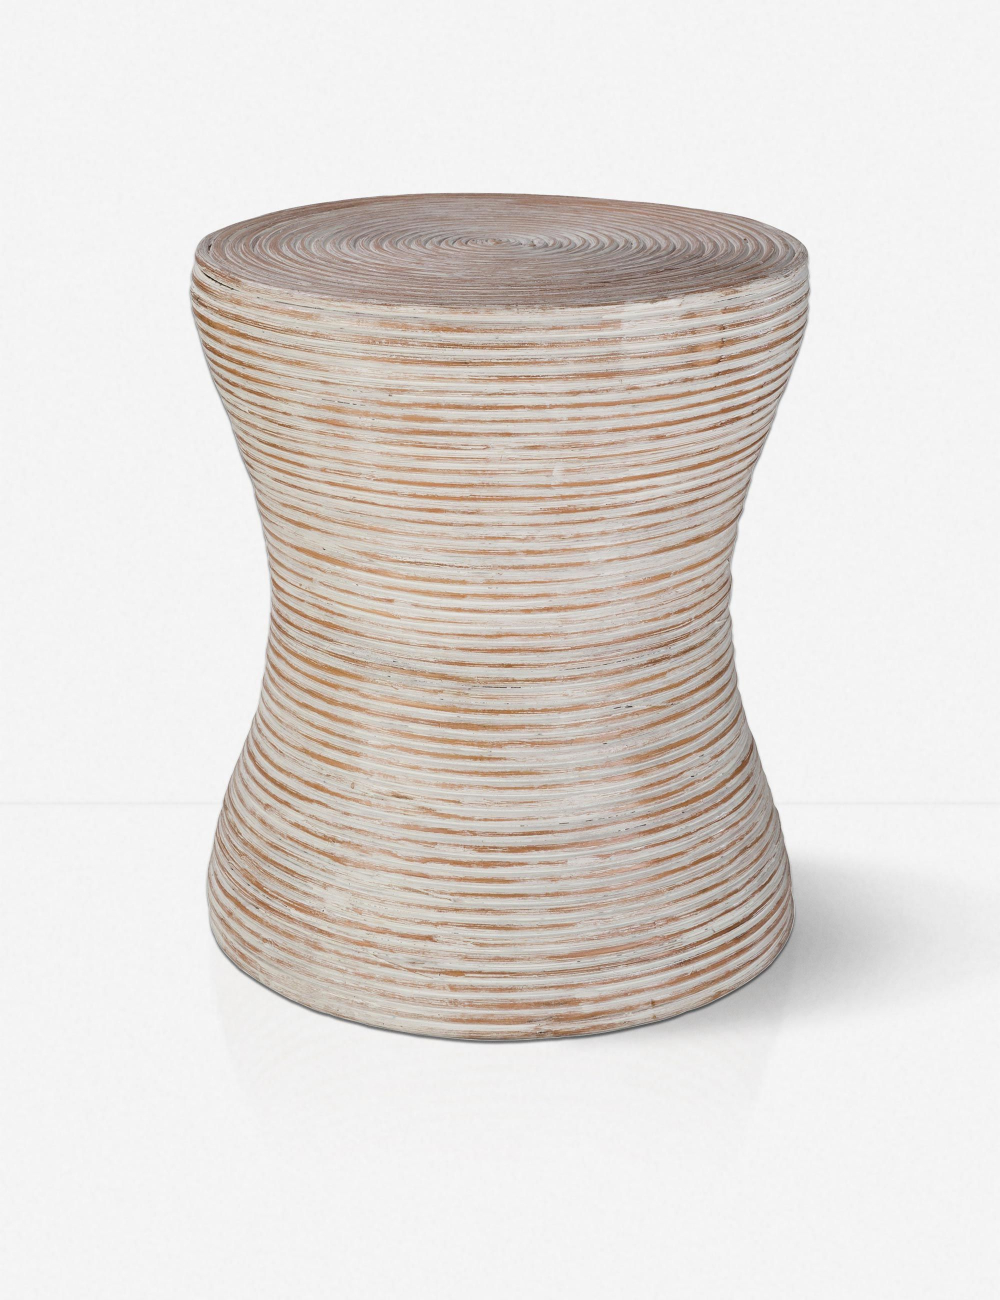 Kujawa Ceramic Garden Stool – Vozeli Pertaining To Kujawa Ceramic Garden Stools (View 17 of 25)